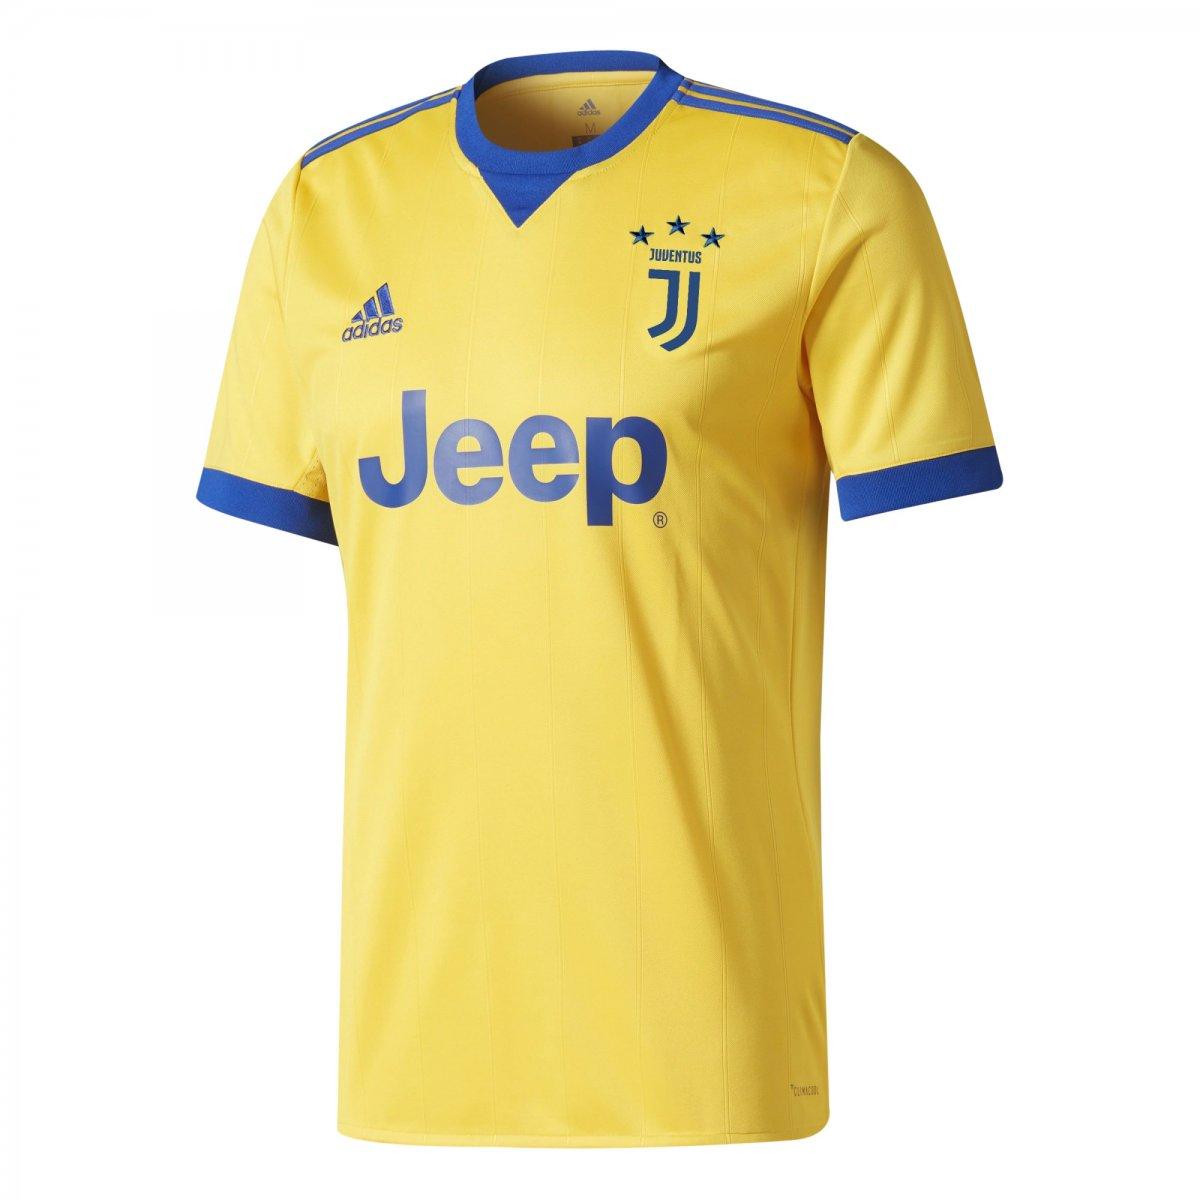 03f667fa0af38 Camiseta Adidas Juventus II BQ4530 - Amarelo Azul - Botas Online ...